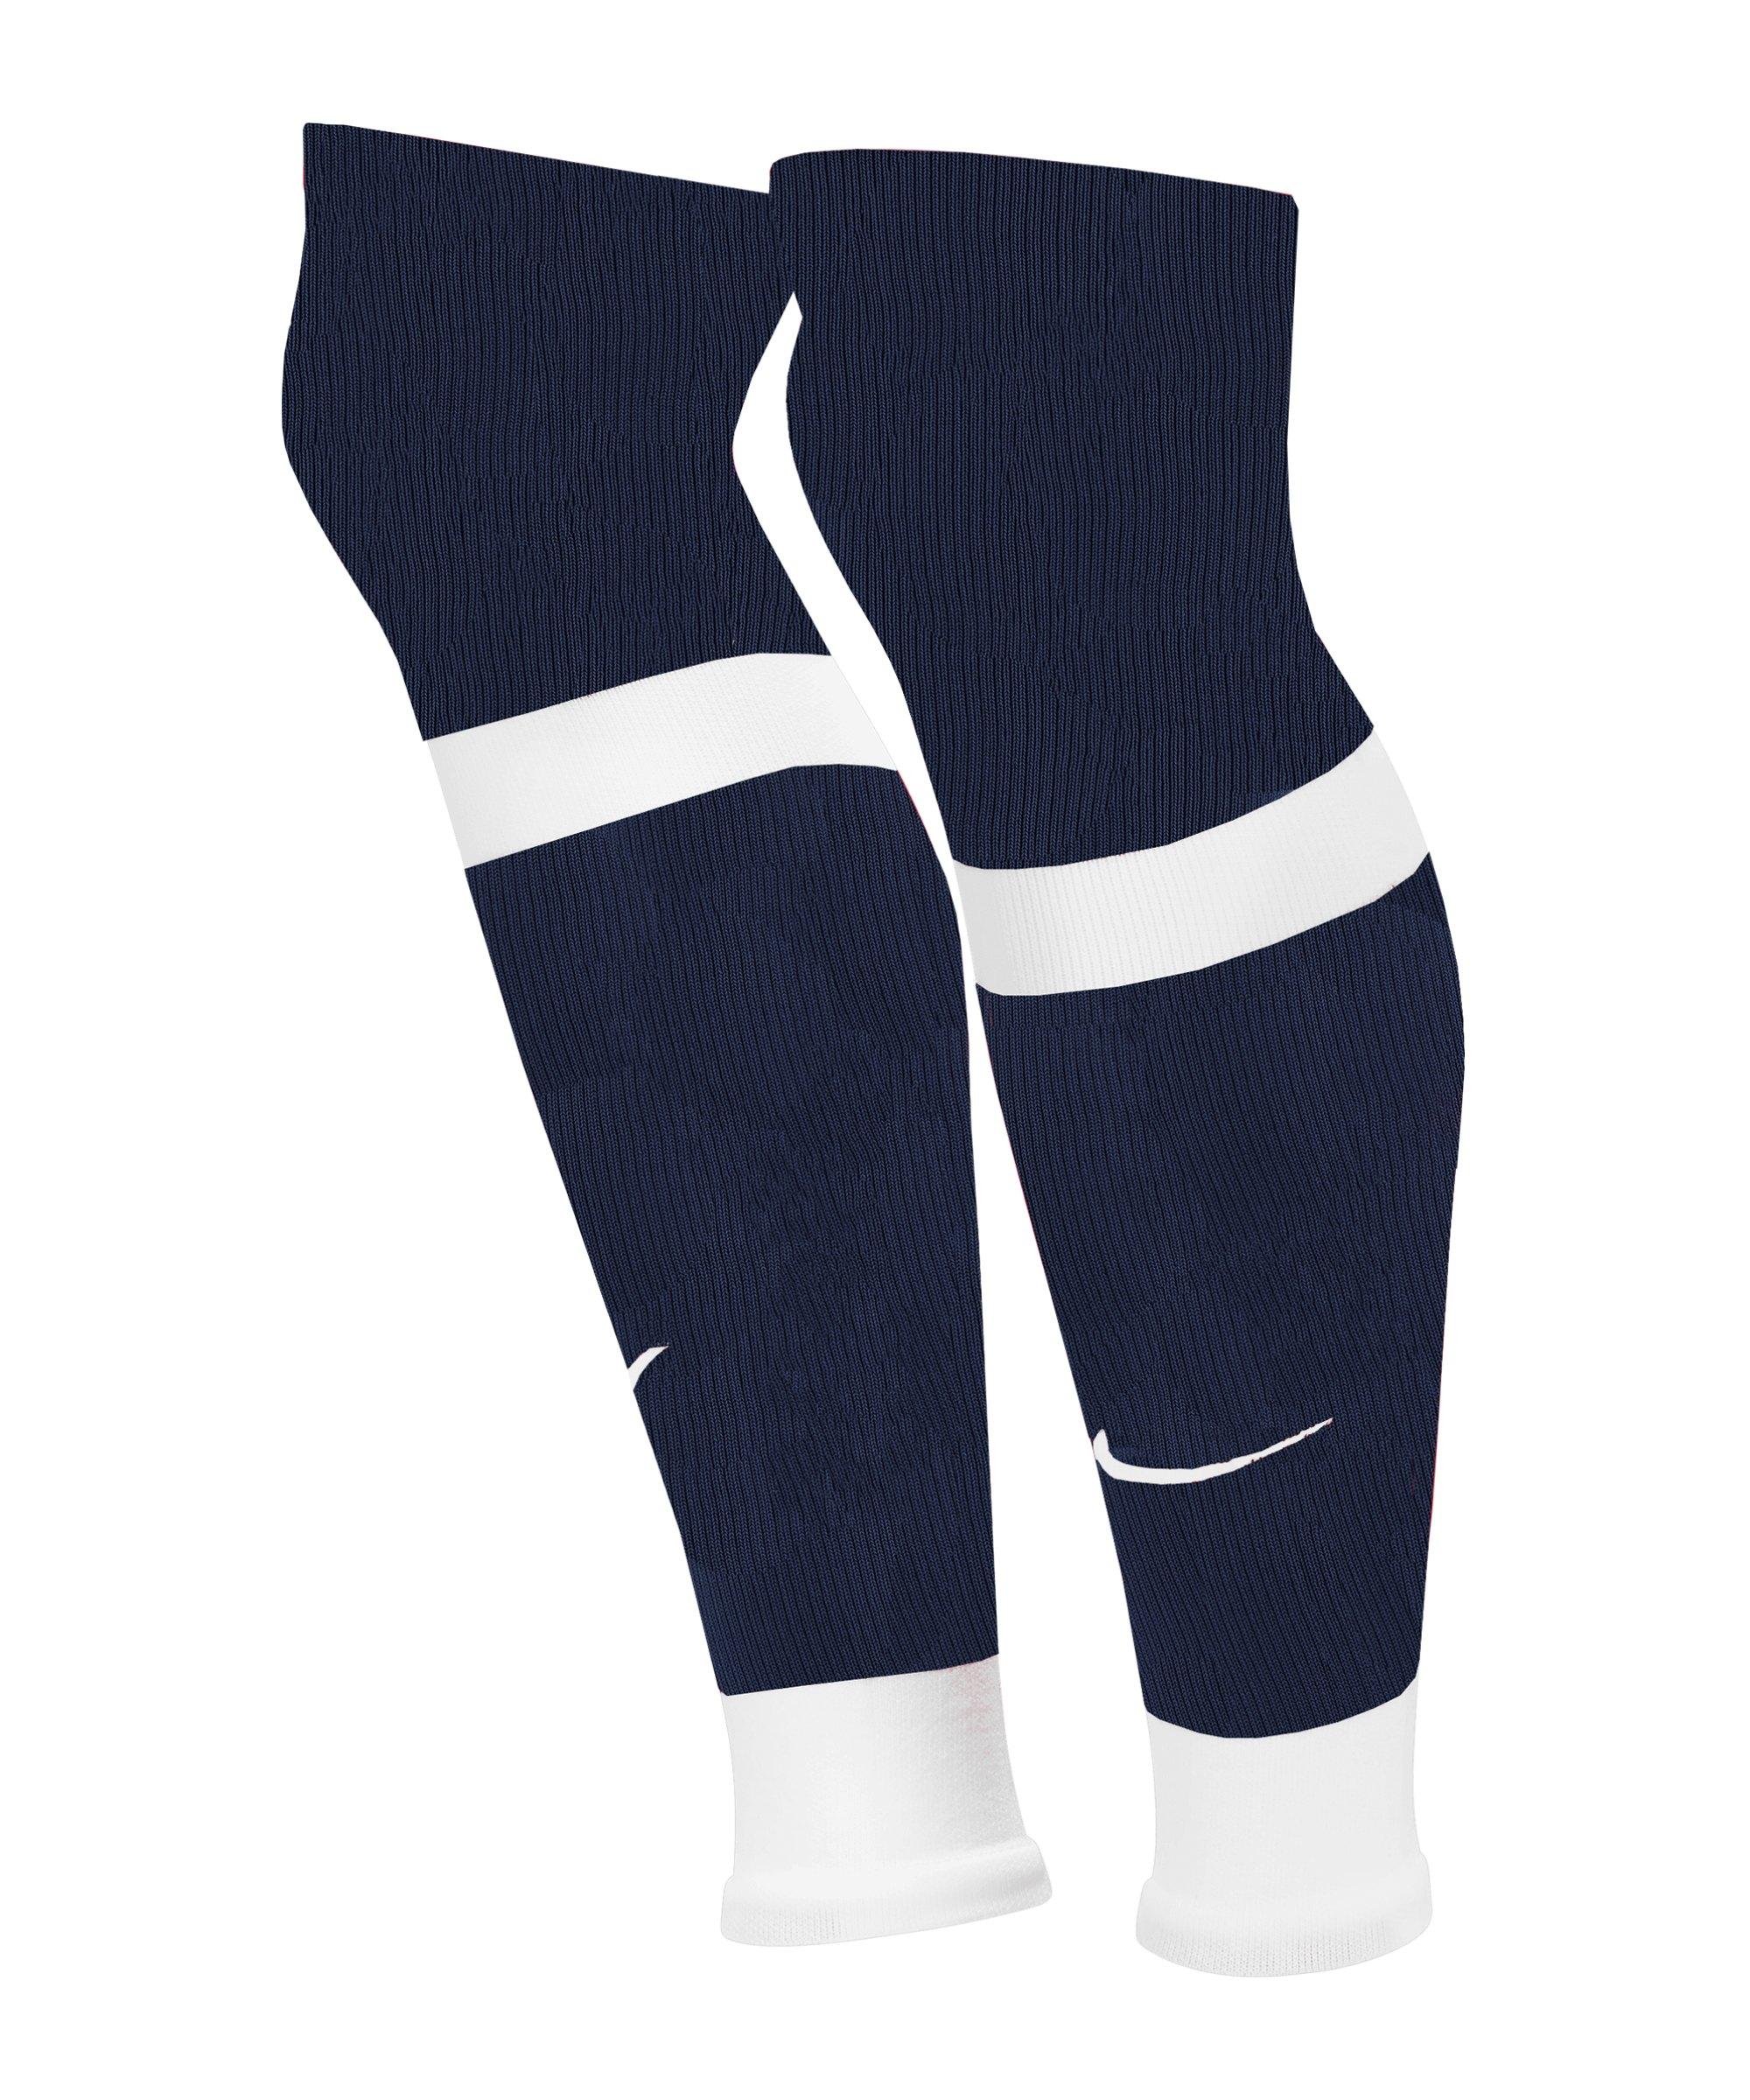 Nike MatchFit Sleeve Blau Weiss F410 - blau